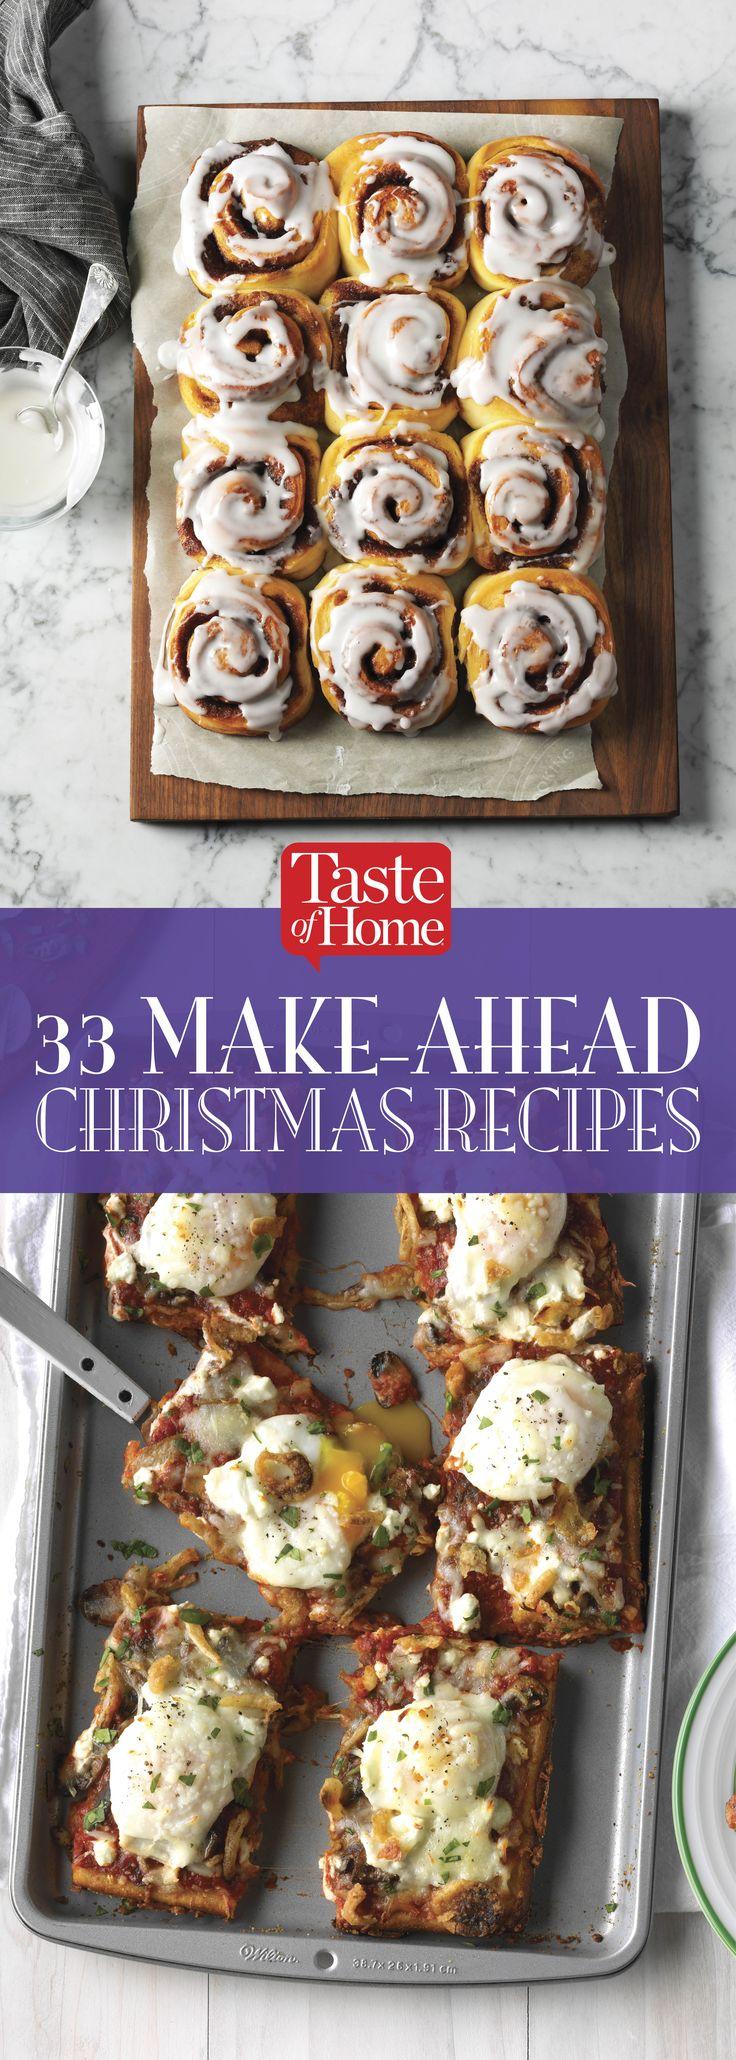 33 Make-Ahead Christmas Recipes